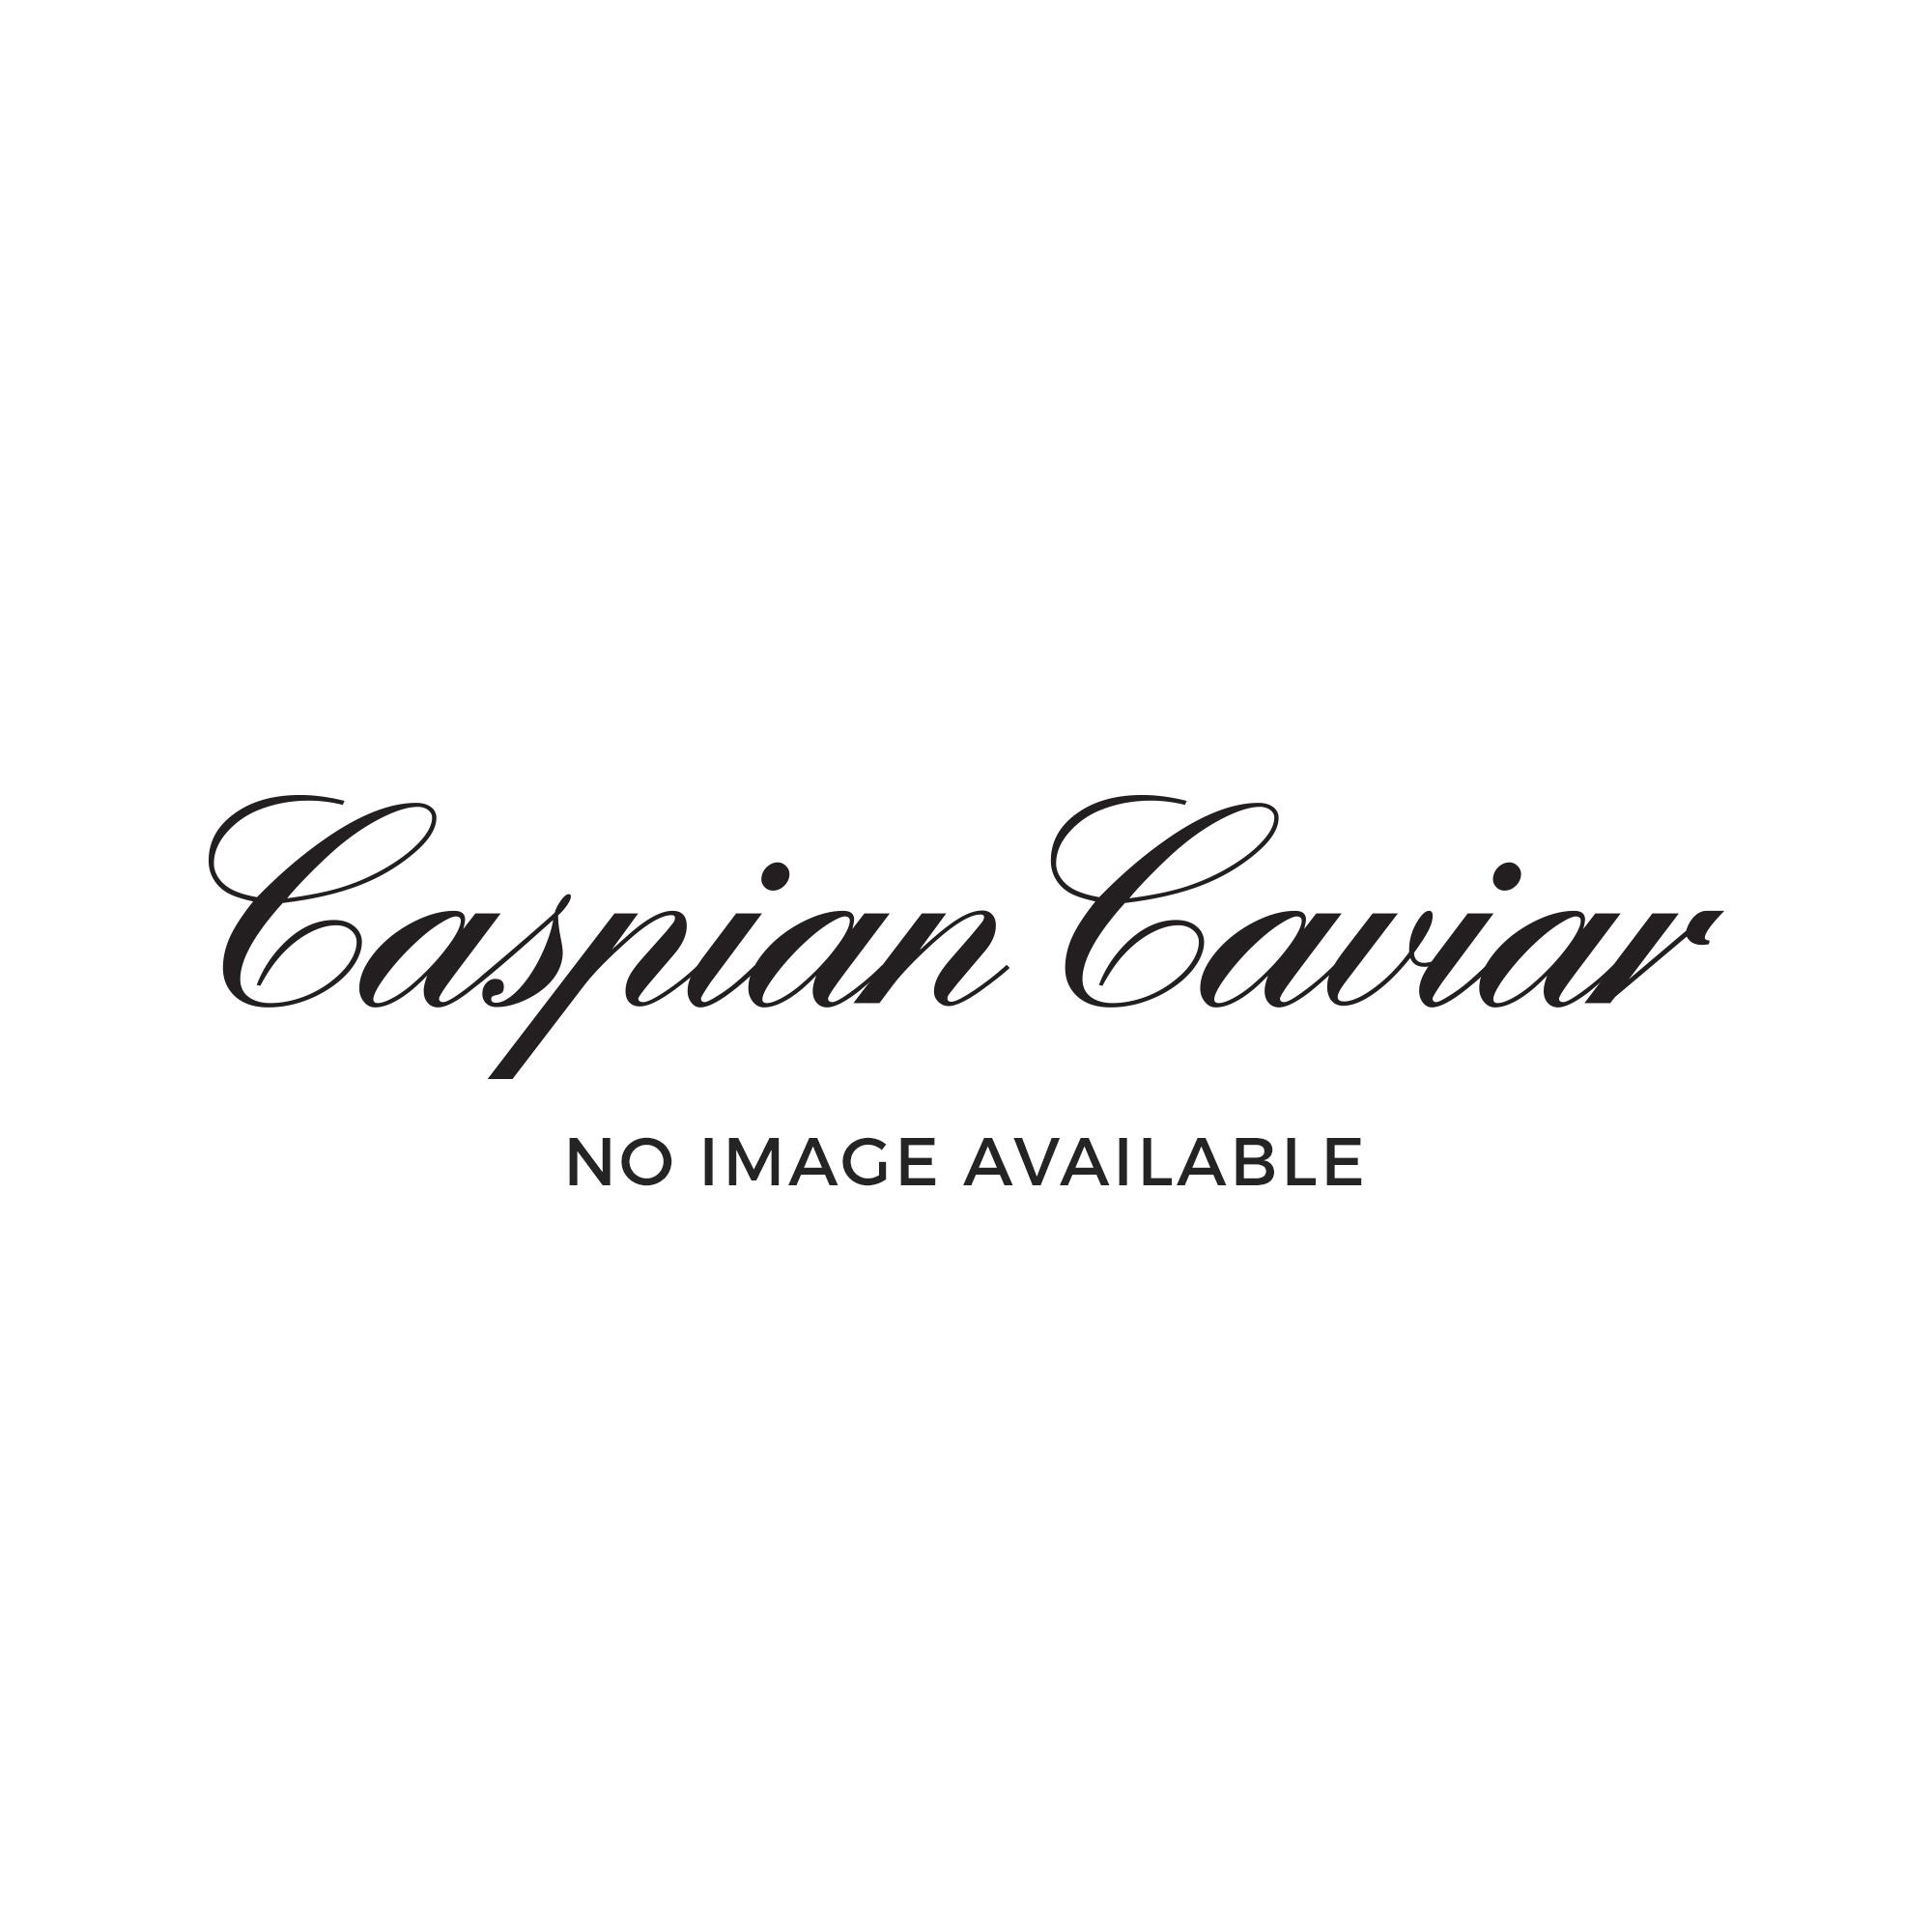 Caspian Caviar Vodka and Beluga Caviar Gift Box 30g or 50g